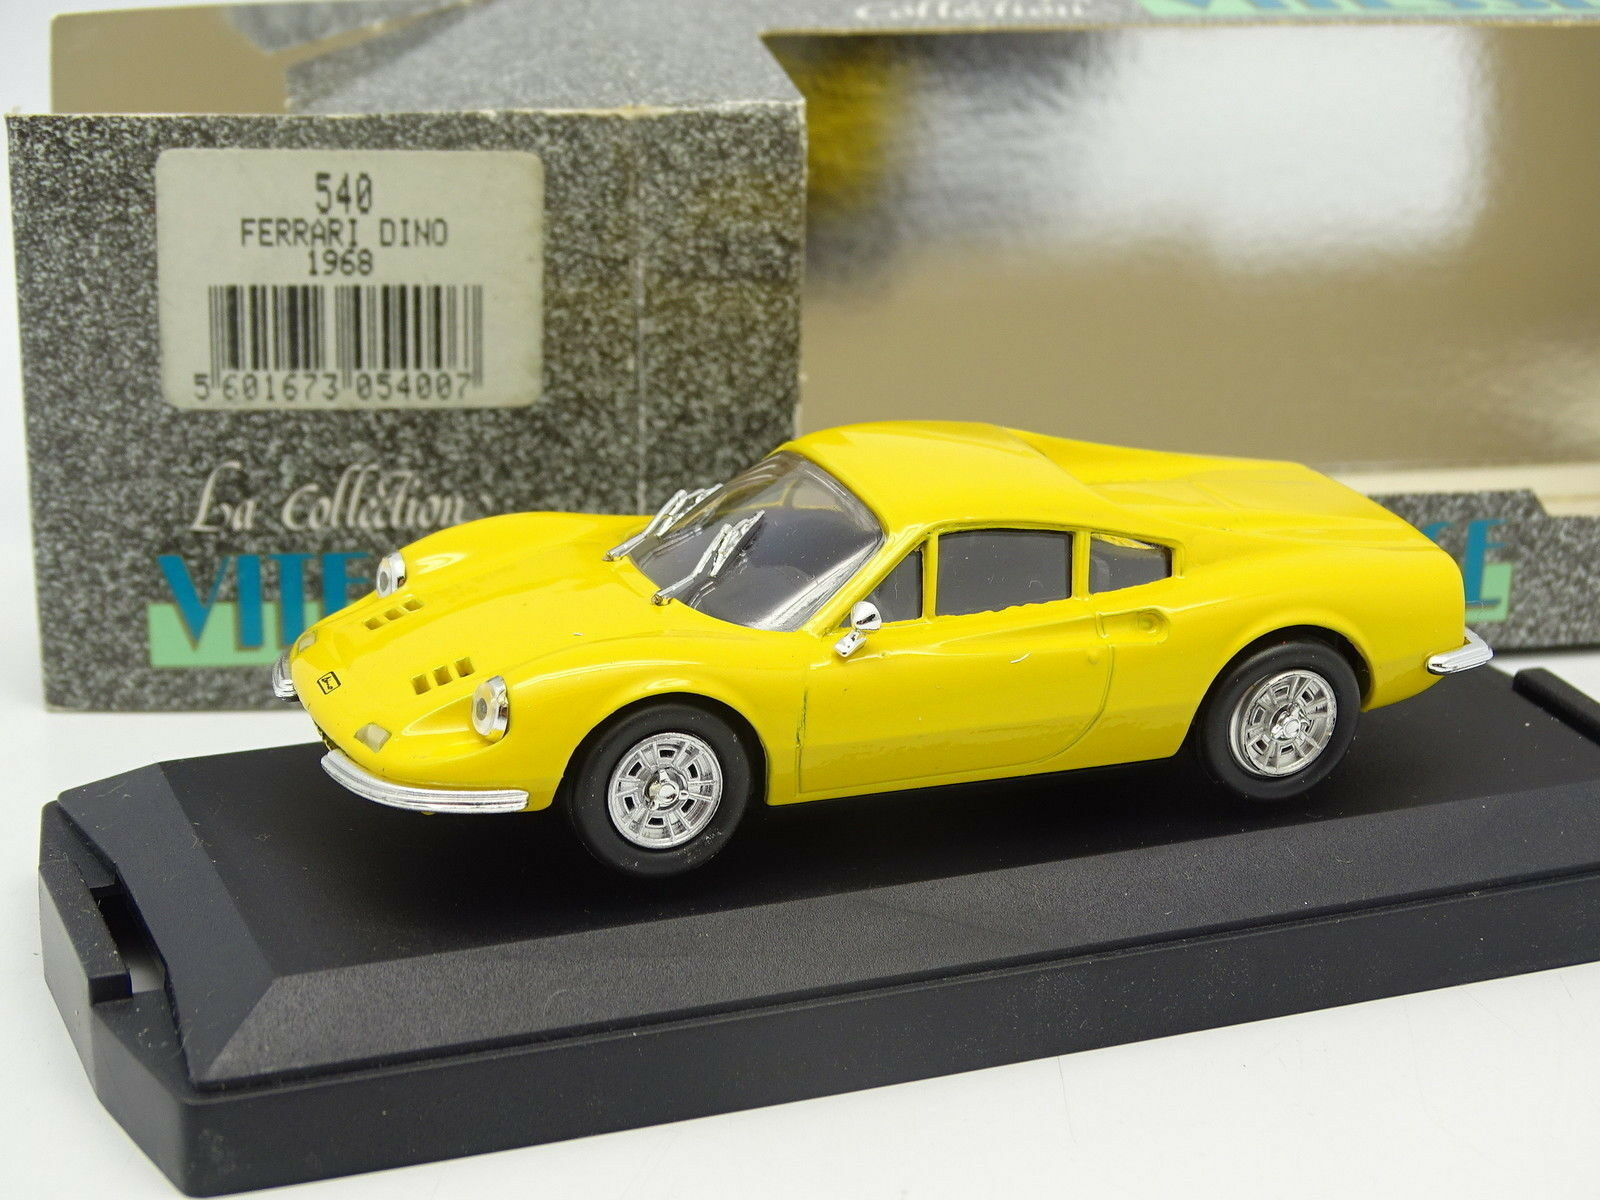 Vitesse 1 43 43 43 - Ferrari Dino 1968 yellow efe4da